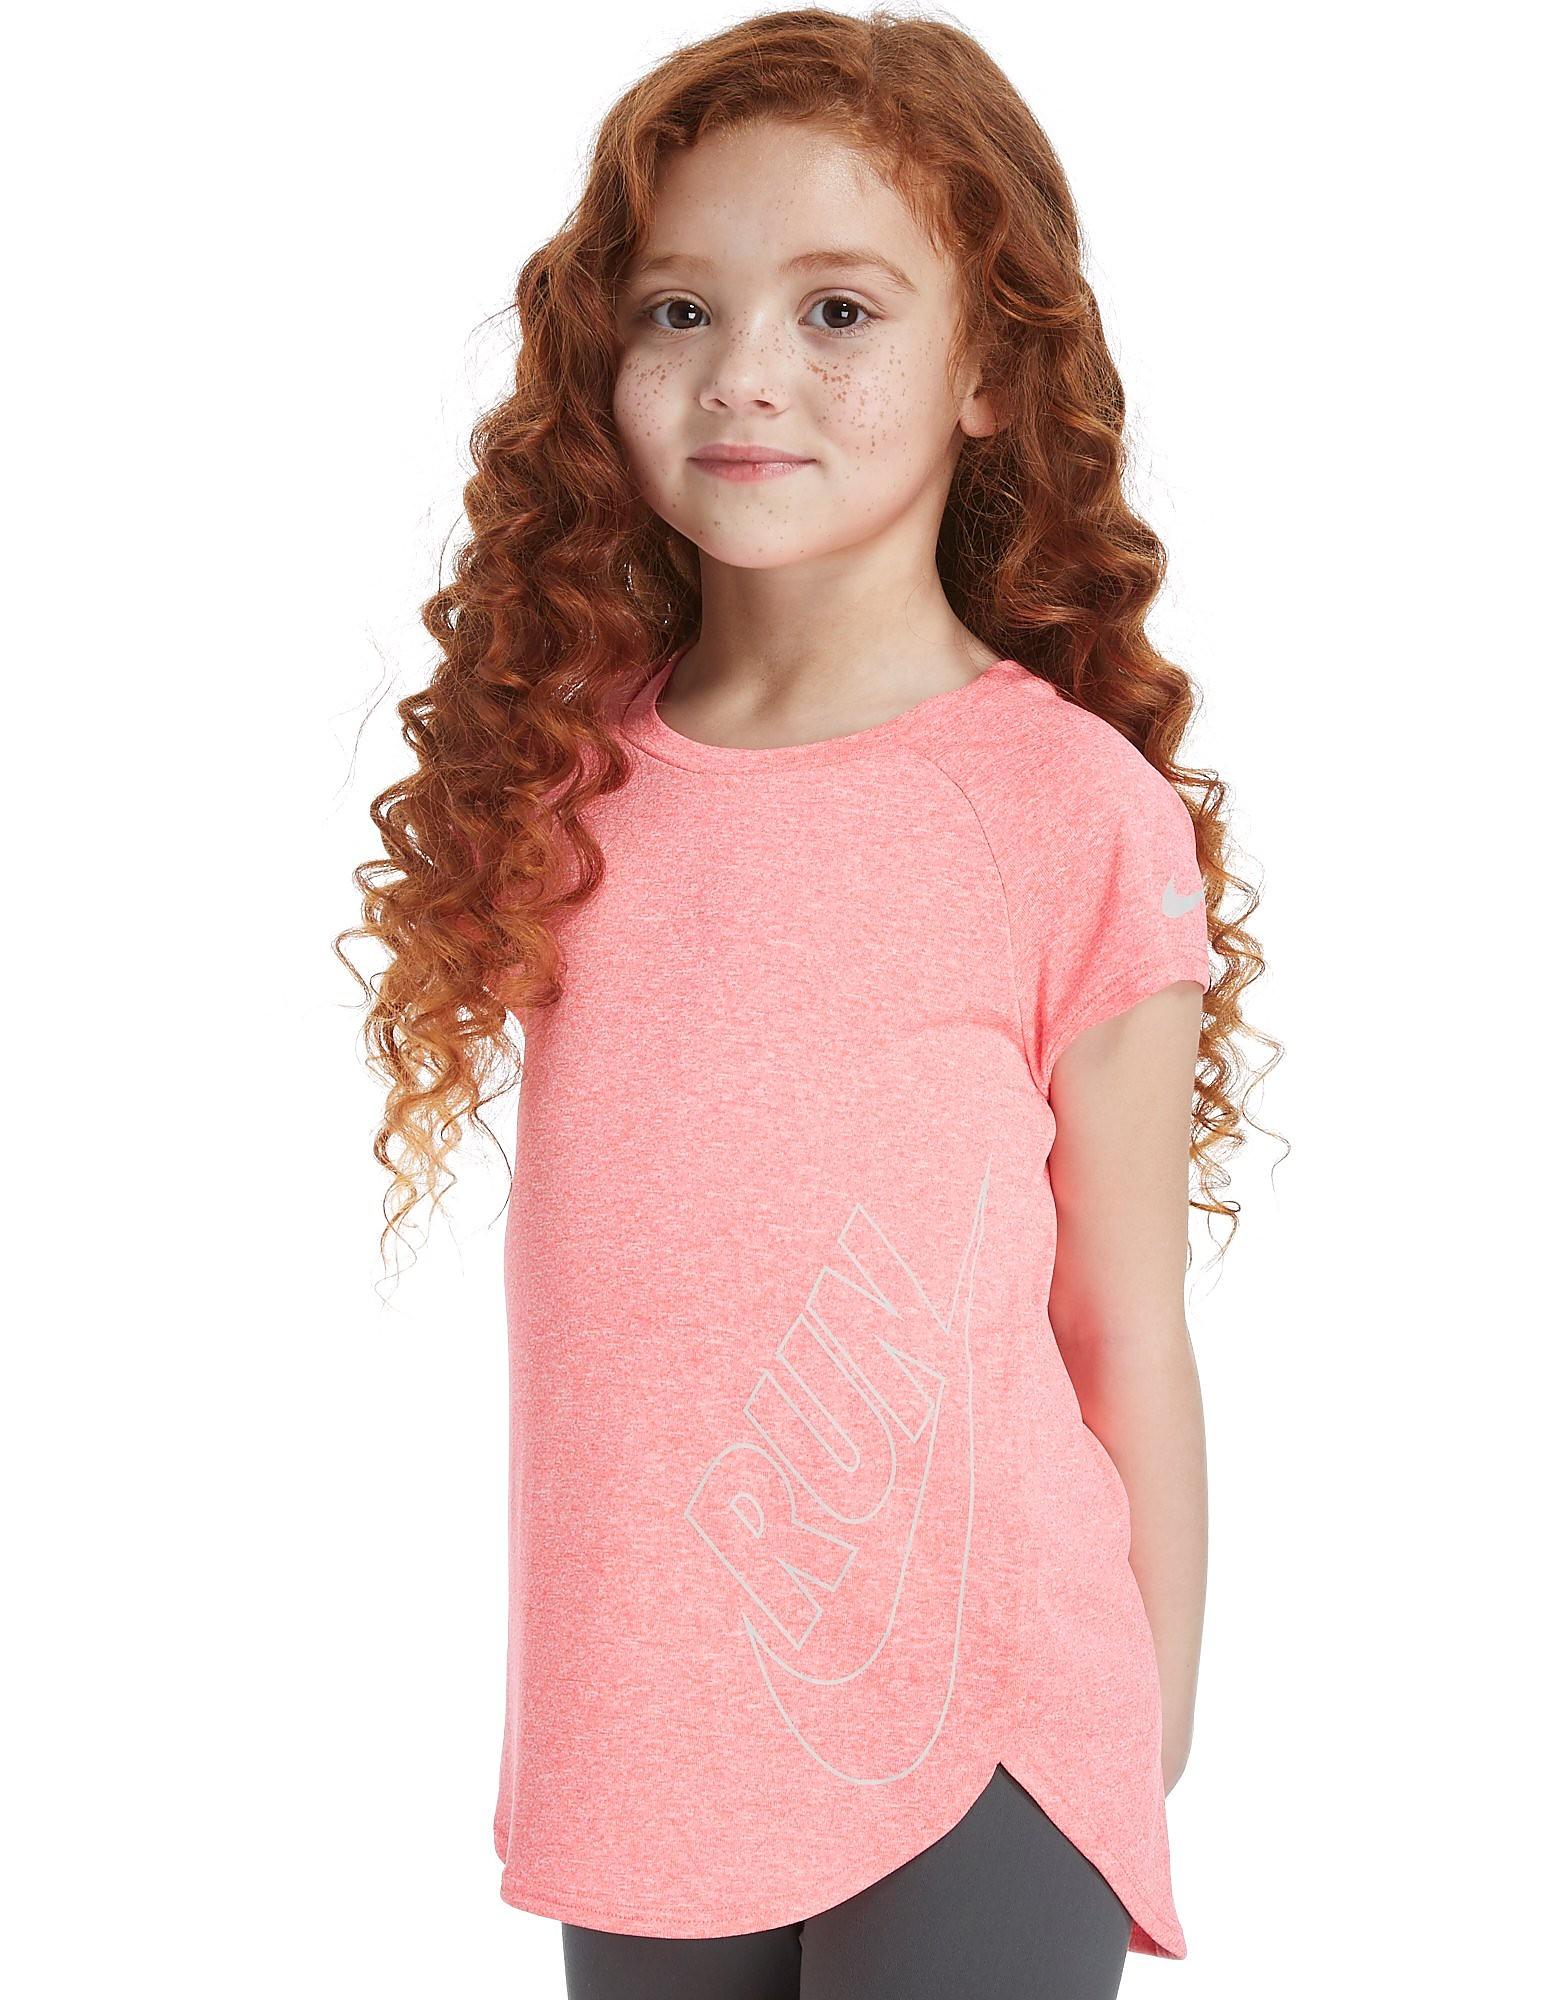 Nike Girls' Short Sleeve Top Children